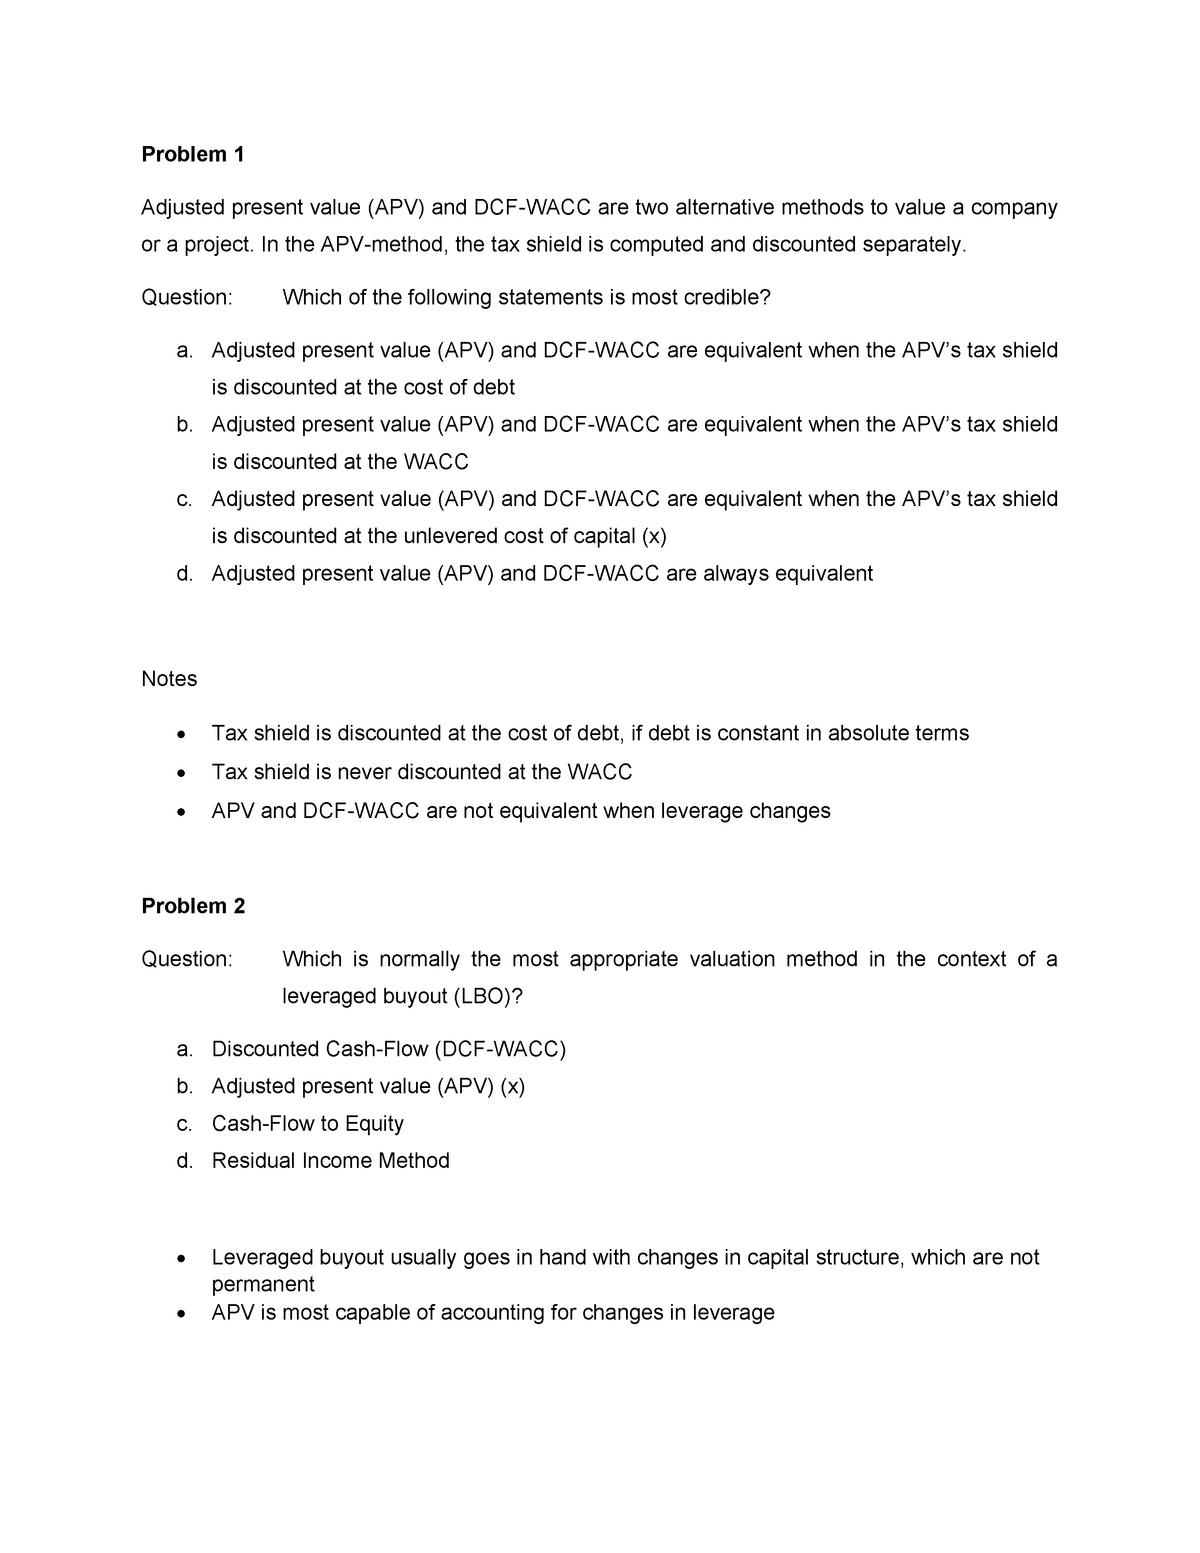 Exam 2015 - FEB13060: Corporate Finance - StuDocu